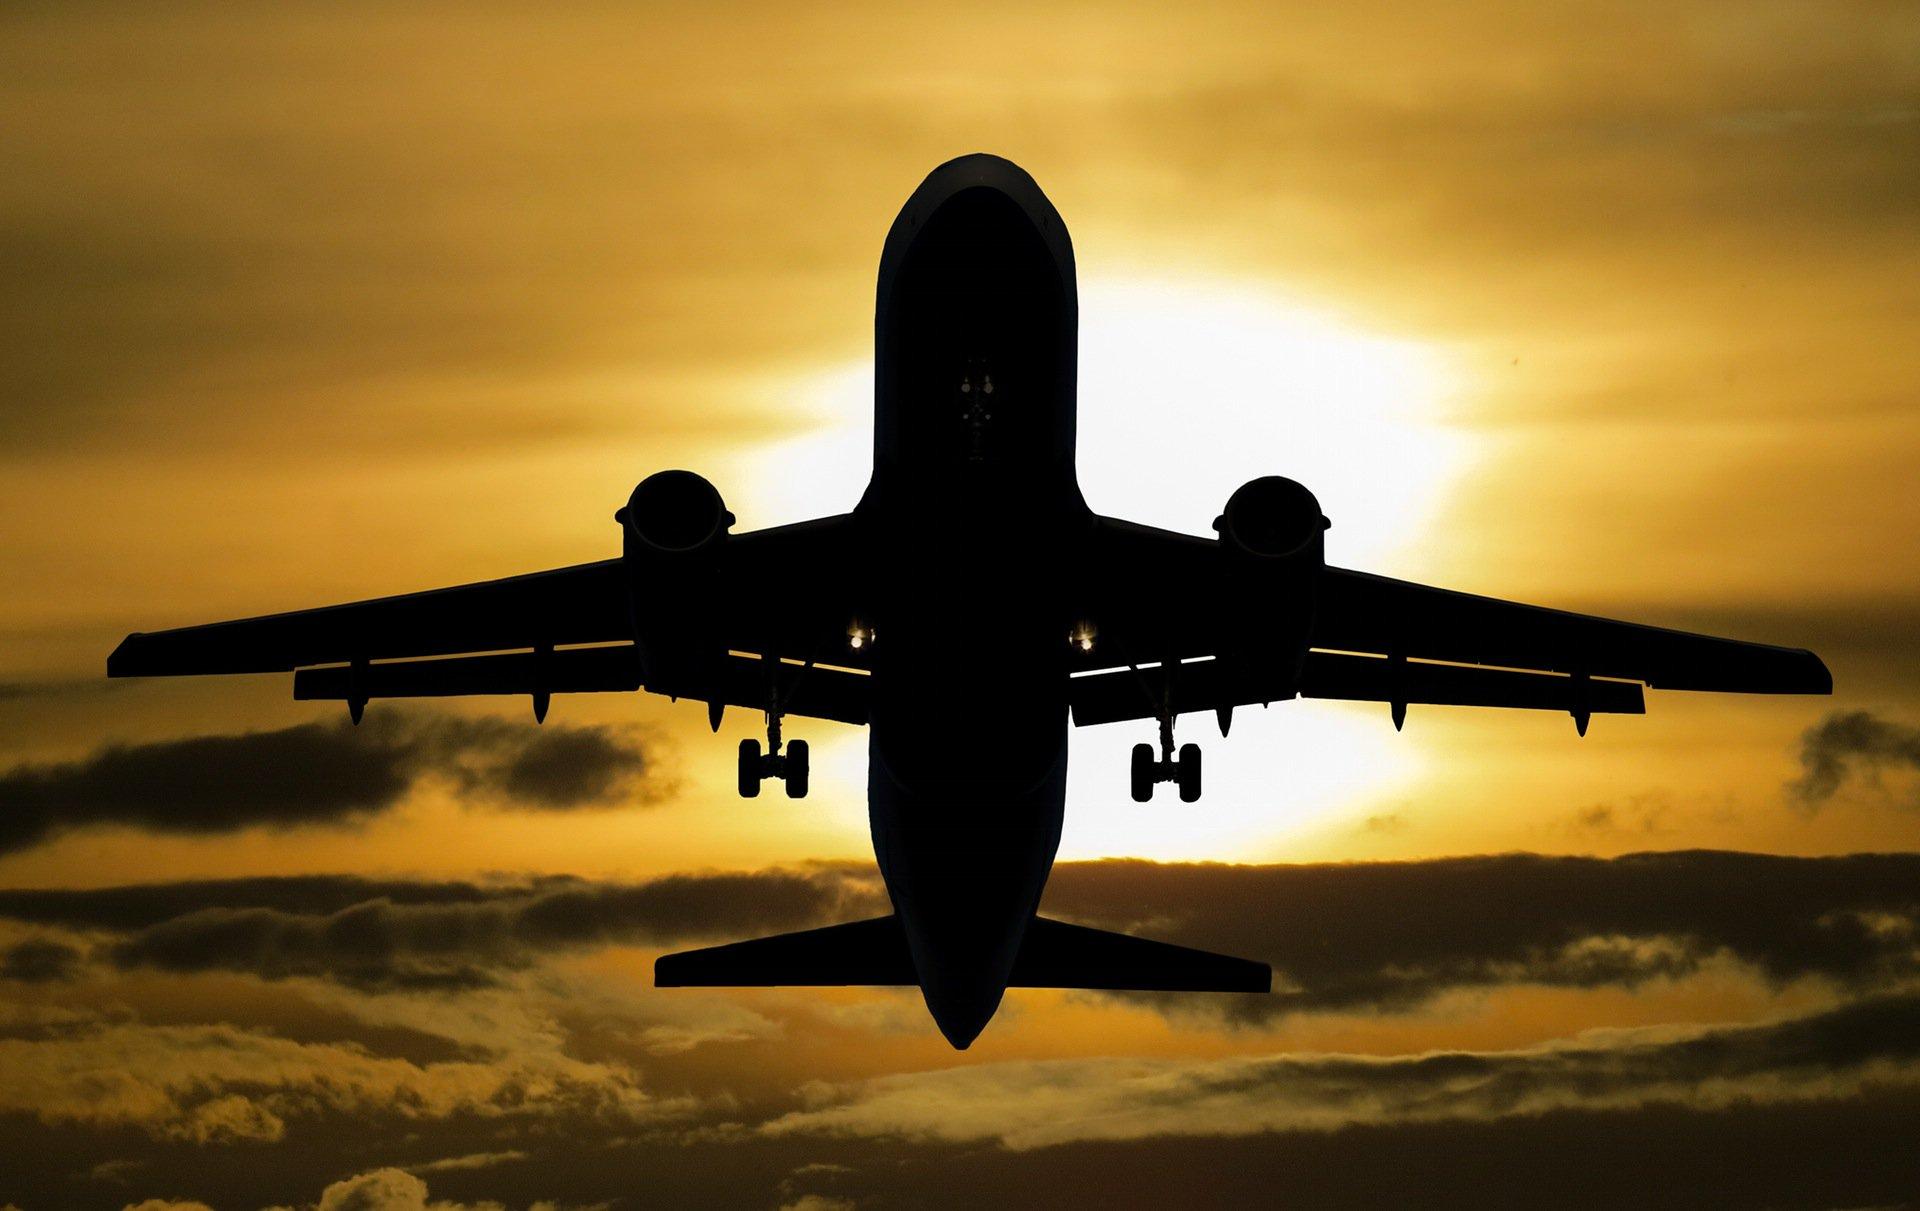 aircraft image 1.jpeg